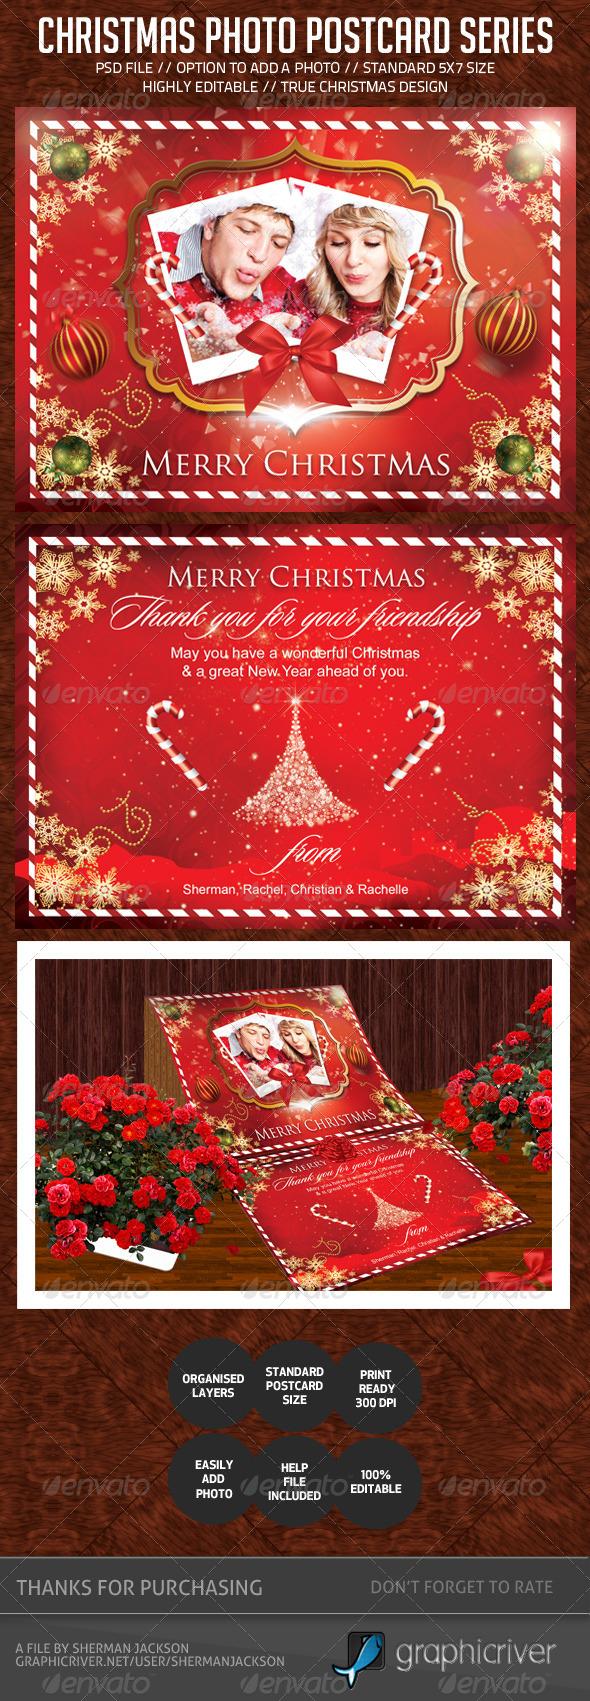 Christmas Holiday Photo Postcard - Holiday Greeting Cards